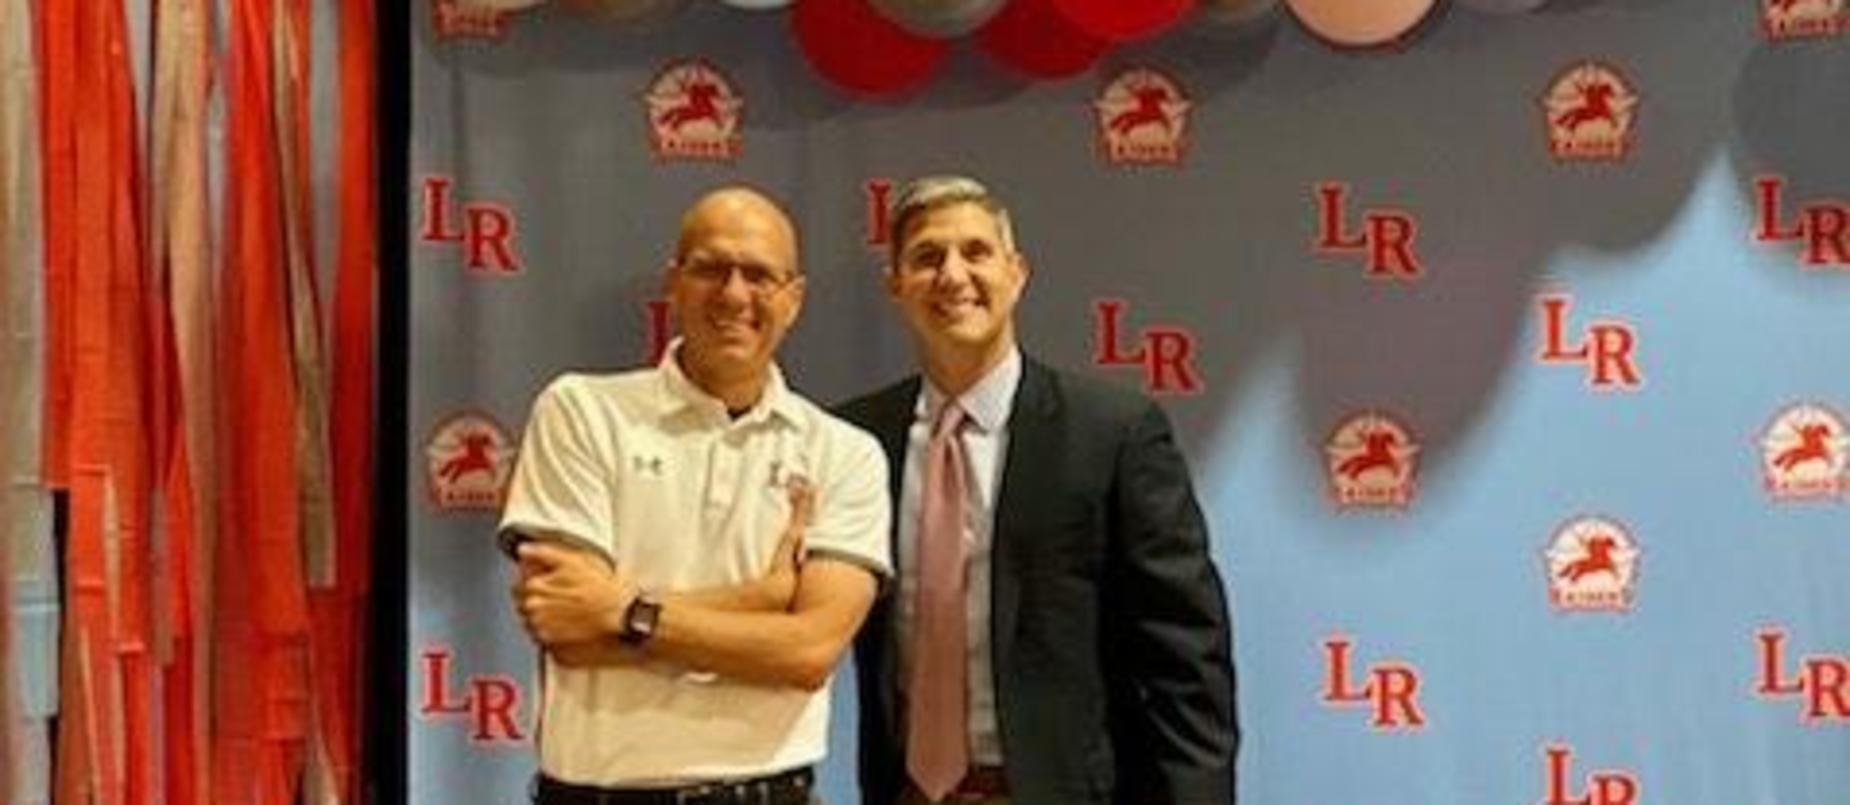 Dr. Tiption with LISD Convocation Guest Speaker Paul Vitale